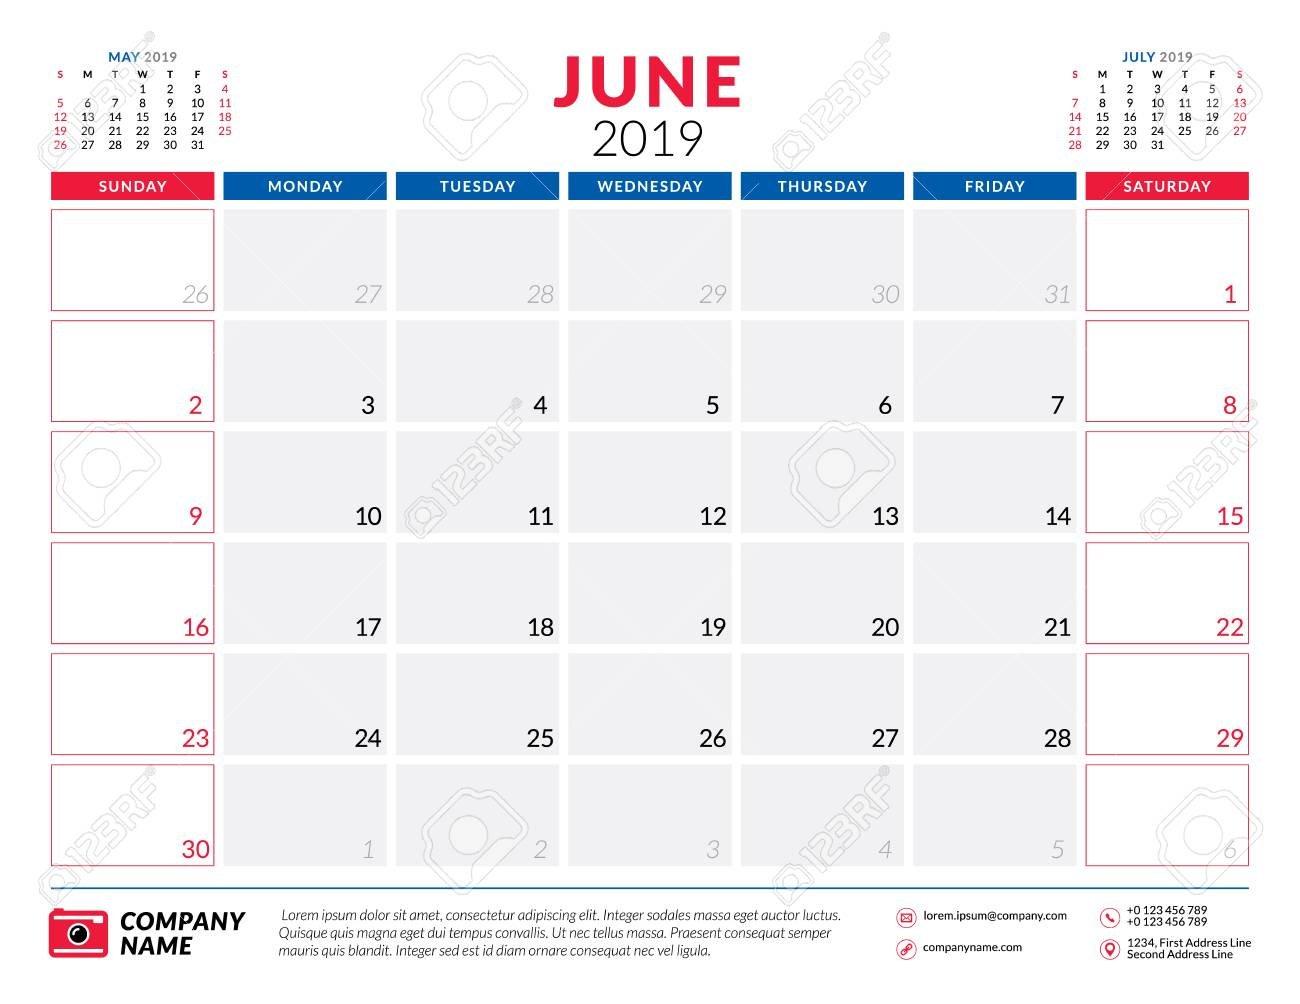 June 2019. Calendar Planner Stationery Design Template. Vector June 7 2019 Calendar